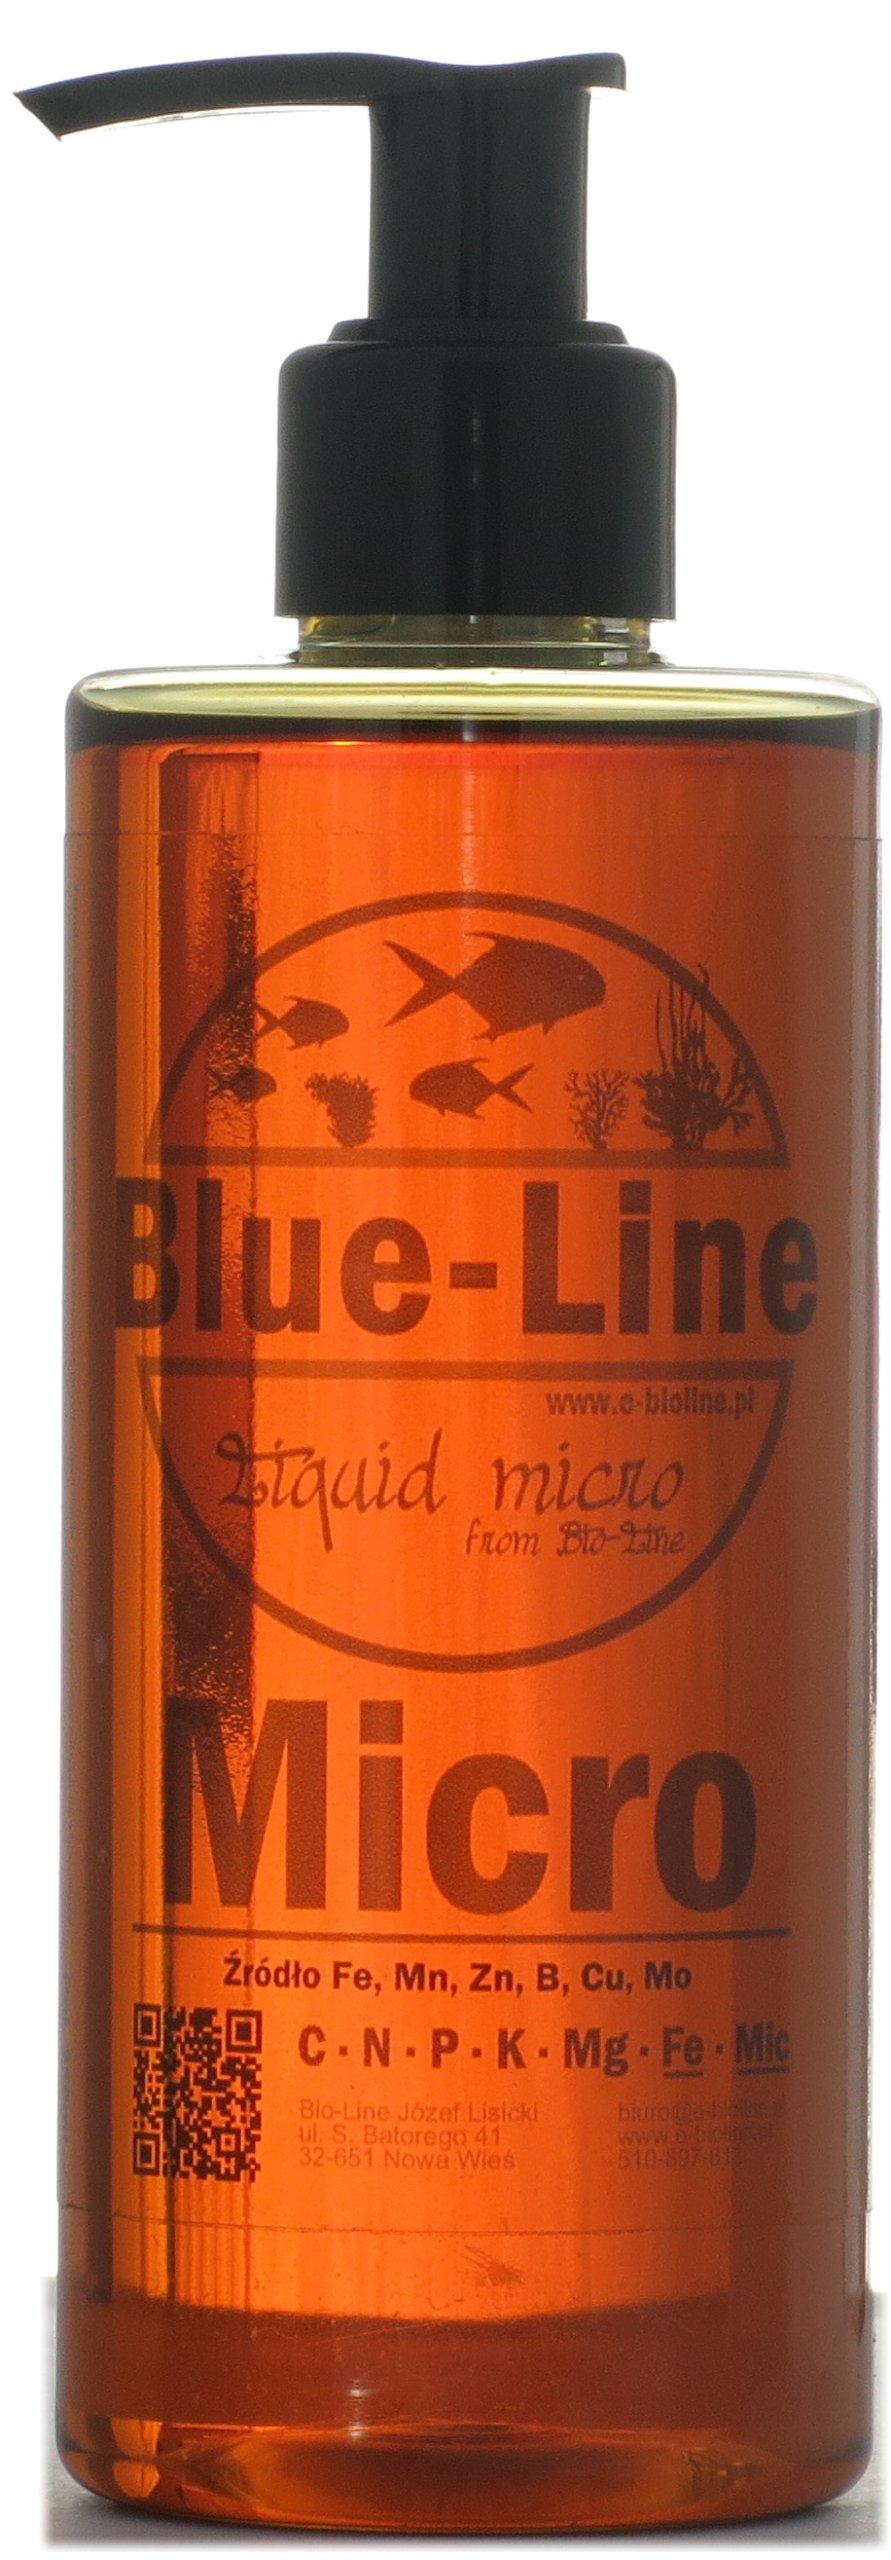 Blue-Line Micro удобрение для аквариум Микро ! 500 мл !